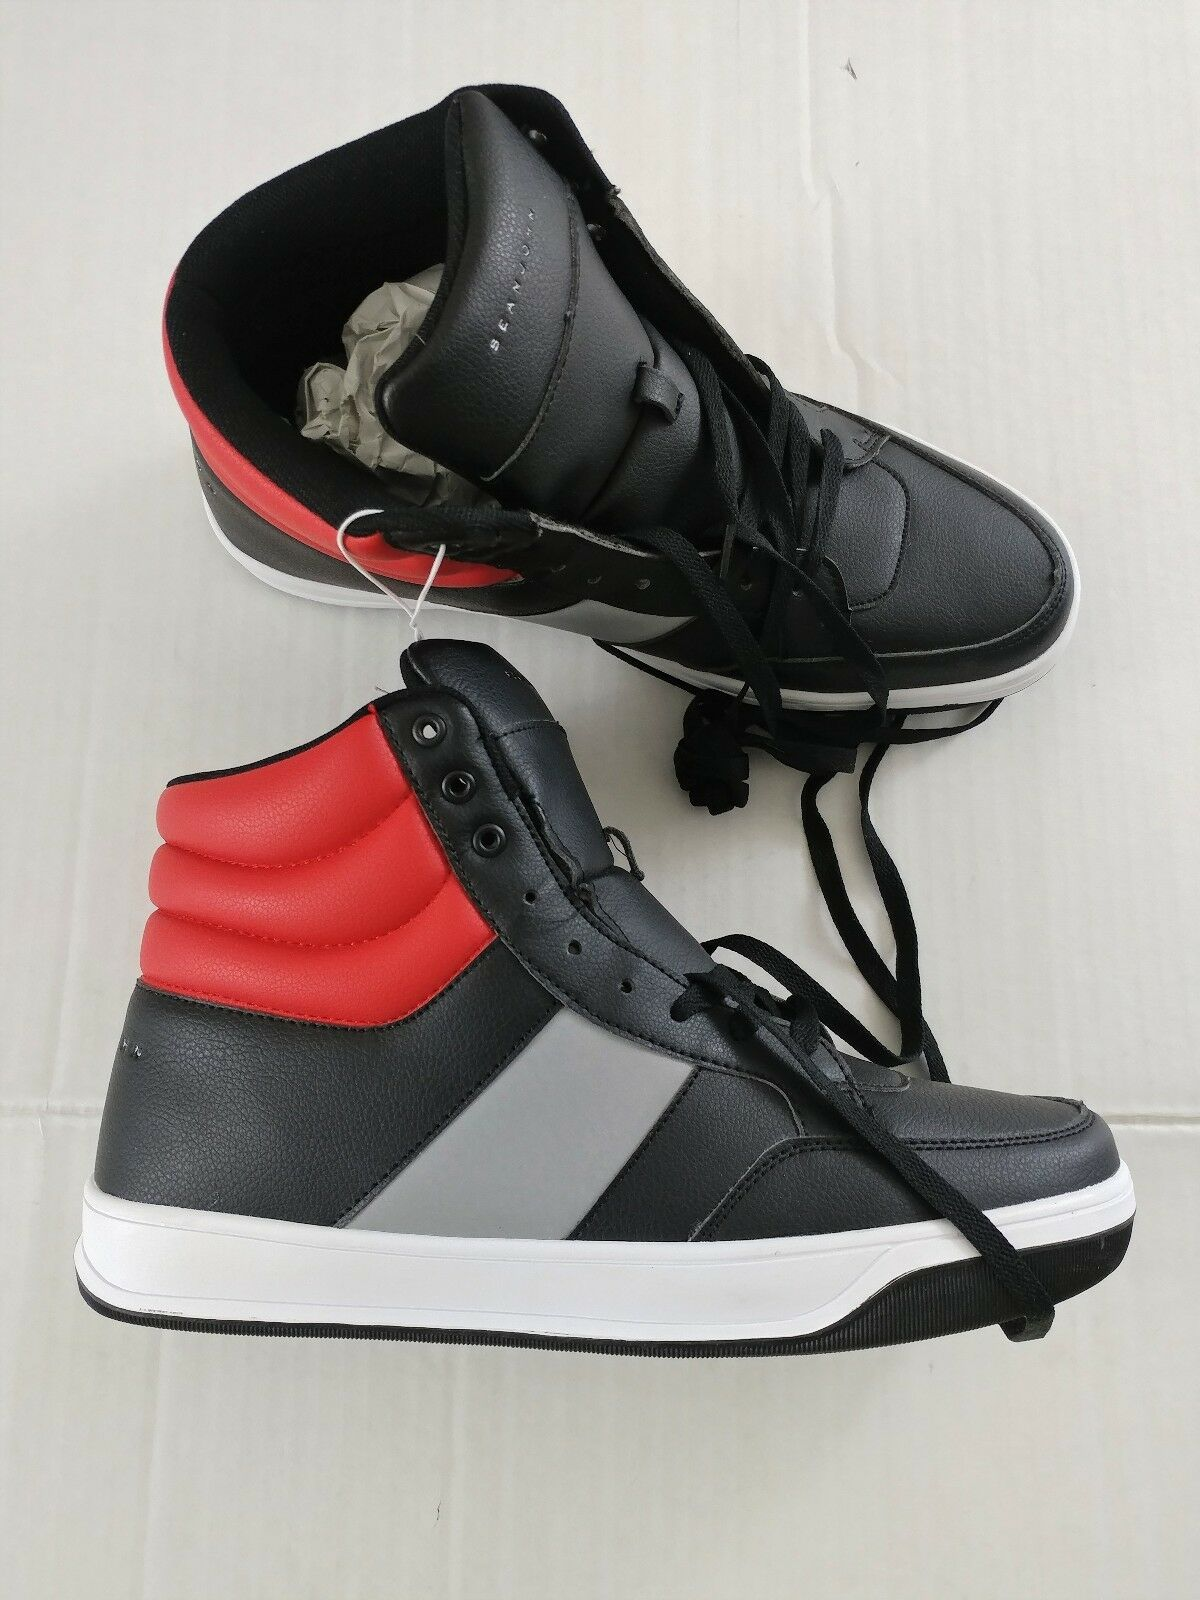 SEAN JOHN Men's High Top Basketball shoes Size 13